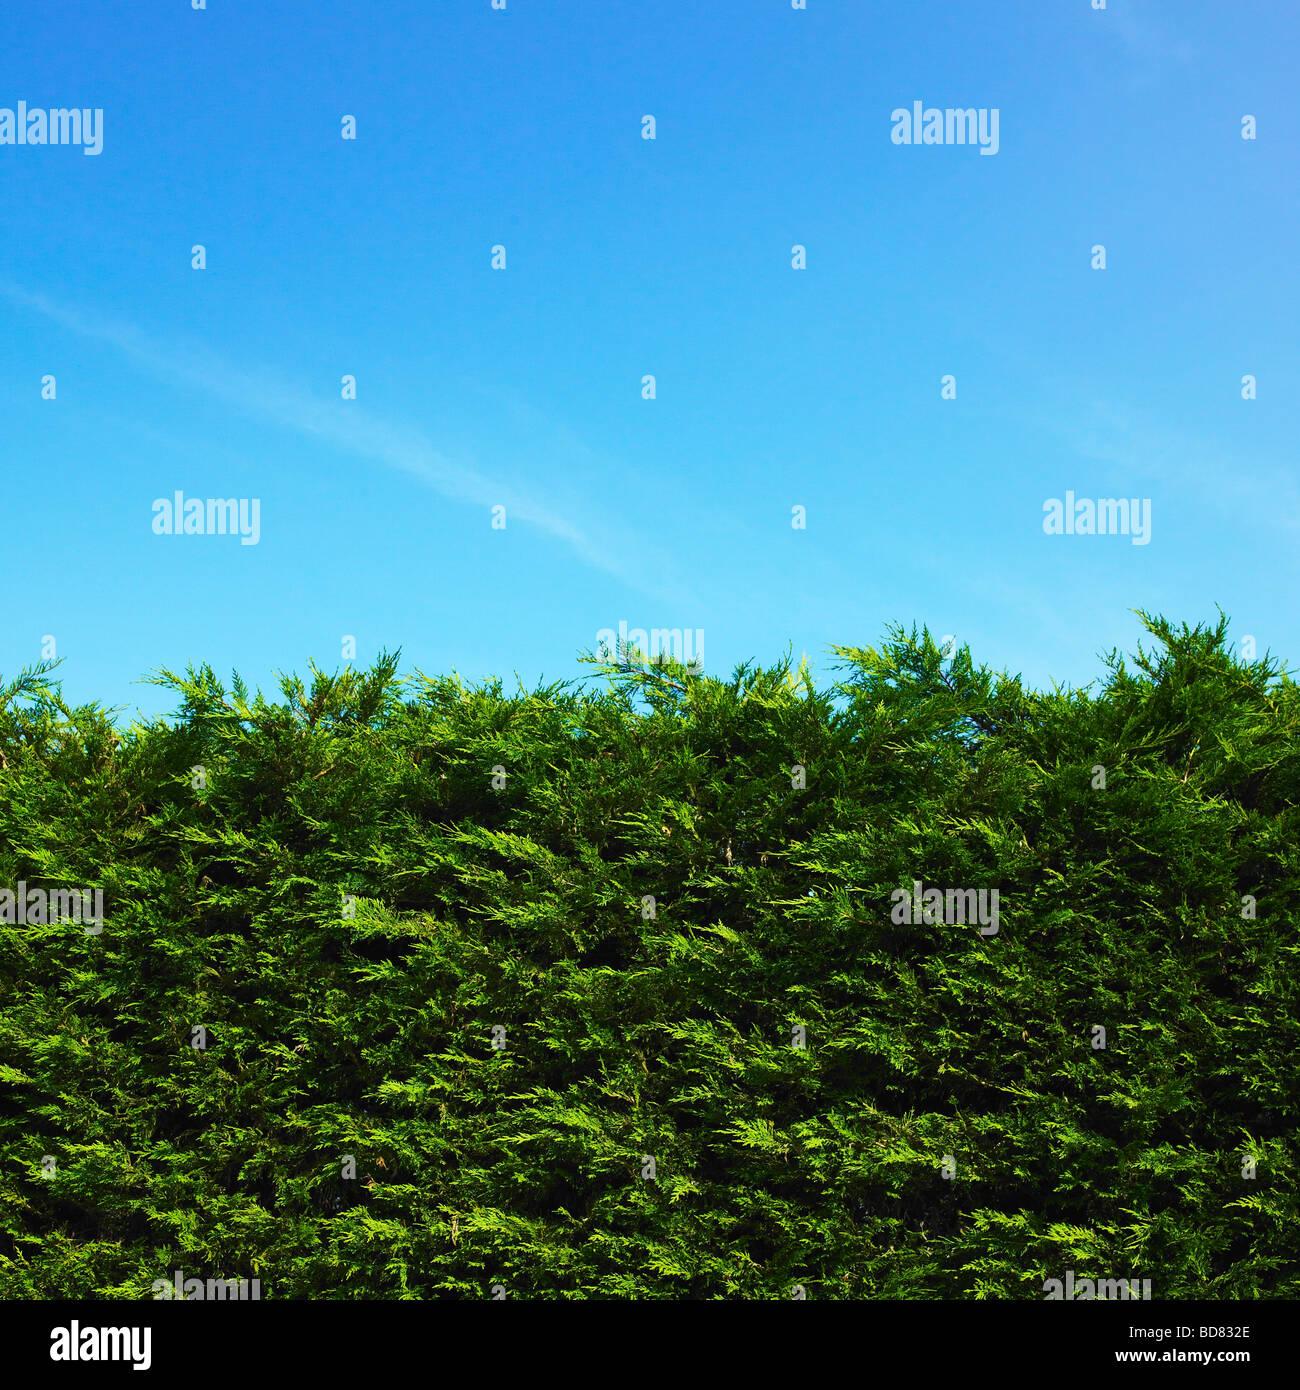 Alta siepe Leylandii e cielo blu. Immagini Stock